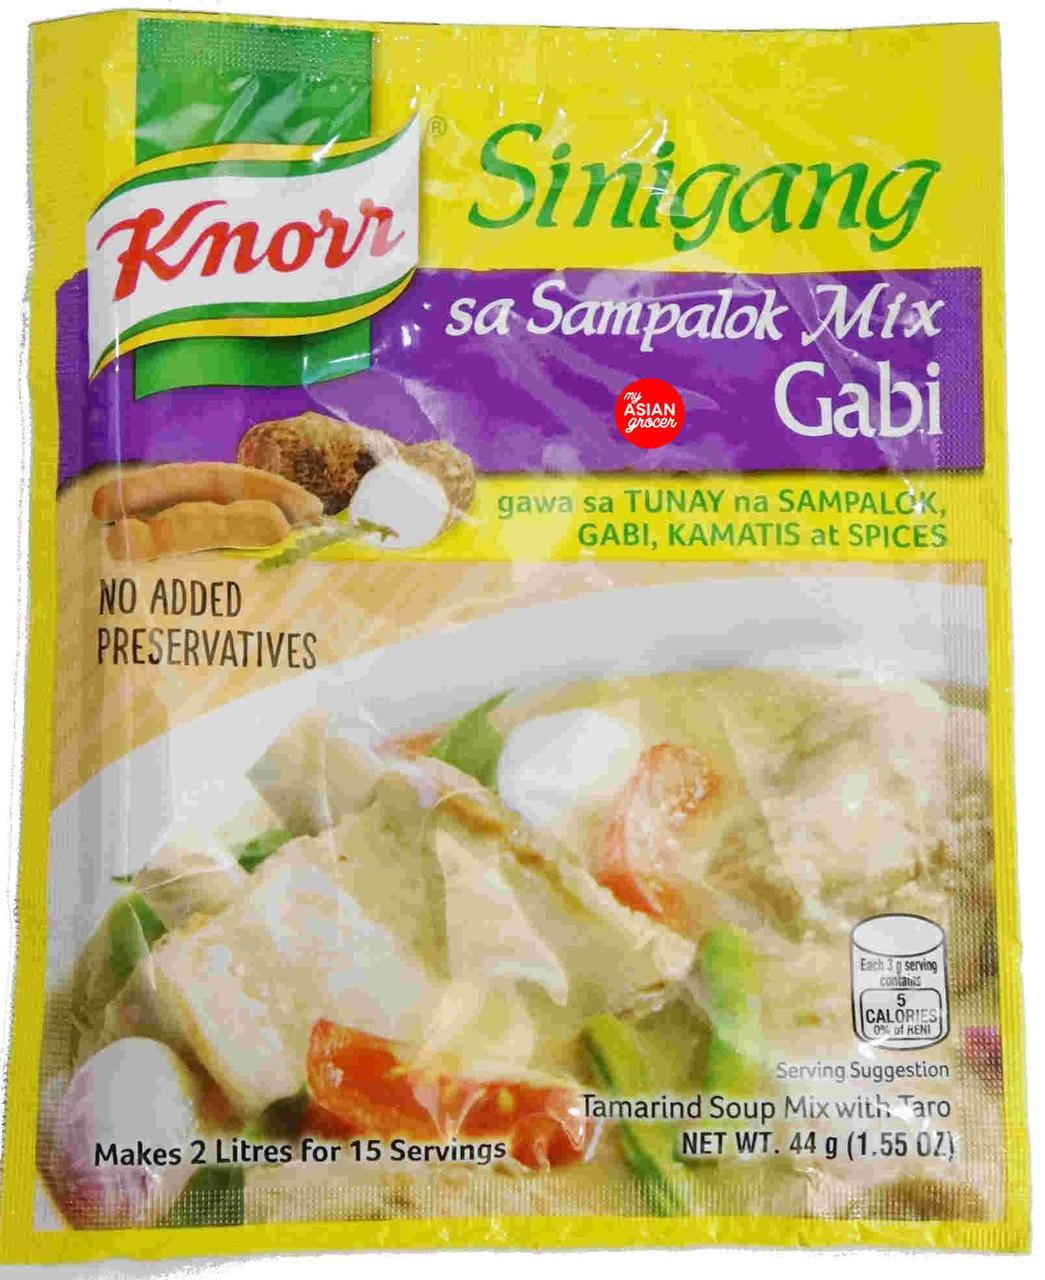 Knorr Tamarind Soup Mix with Taro 44g